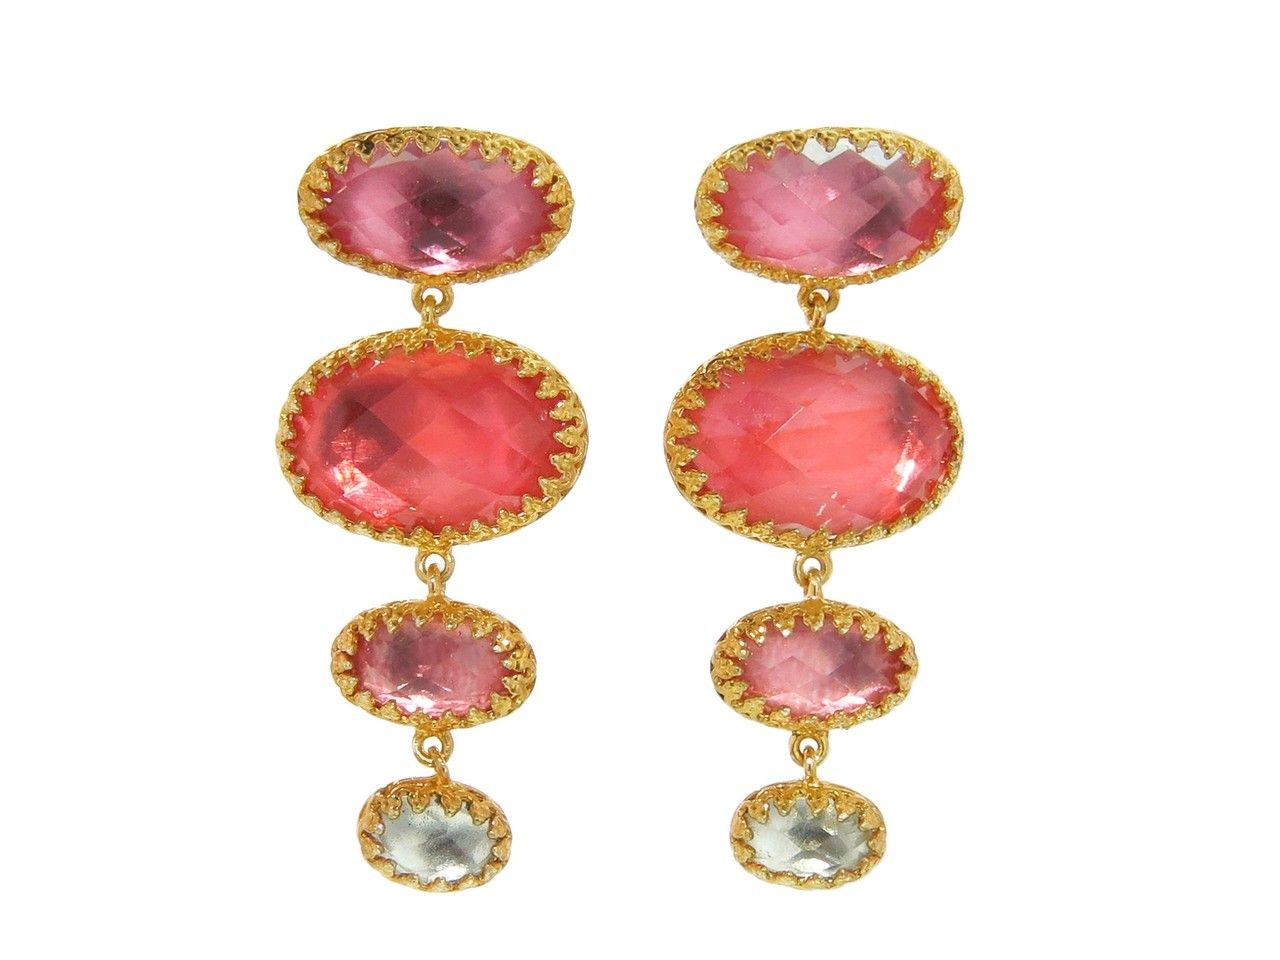 Small Handmade Tessa Earrings in Blush by Larkspur & Hawk, at Ylang 23